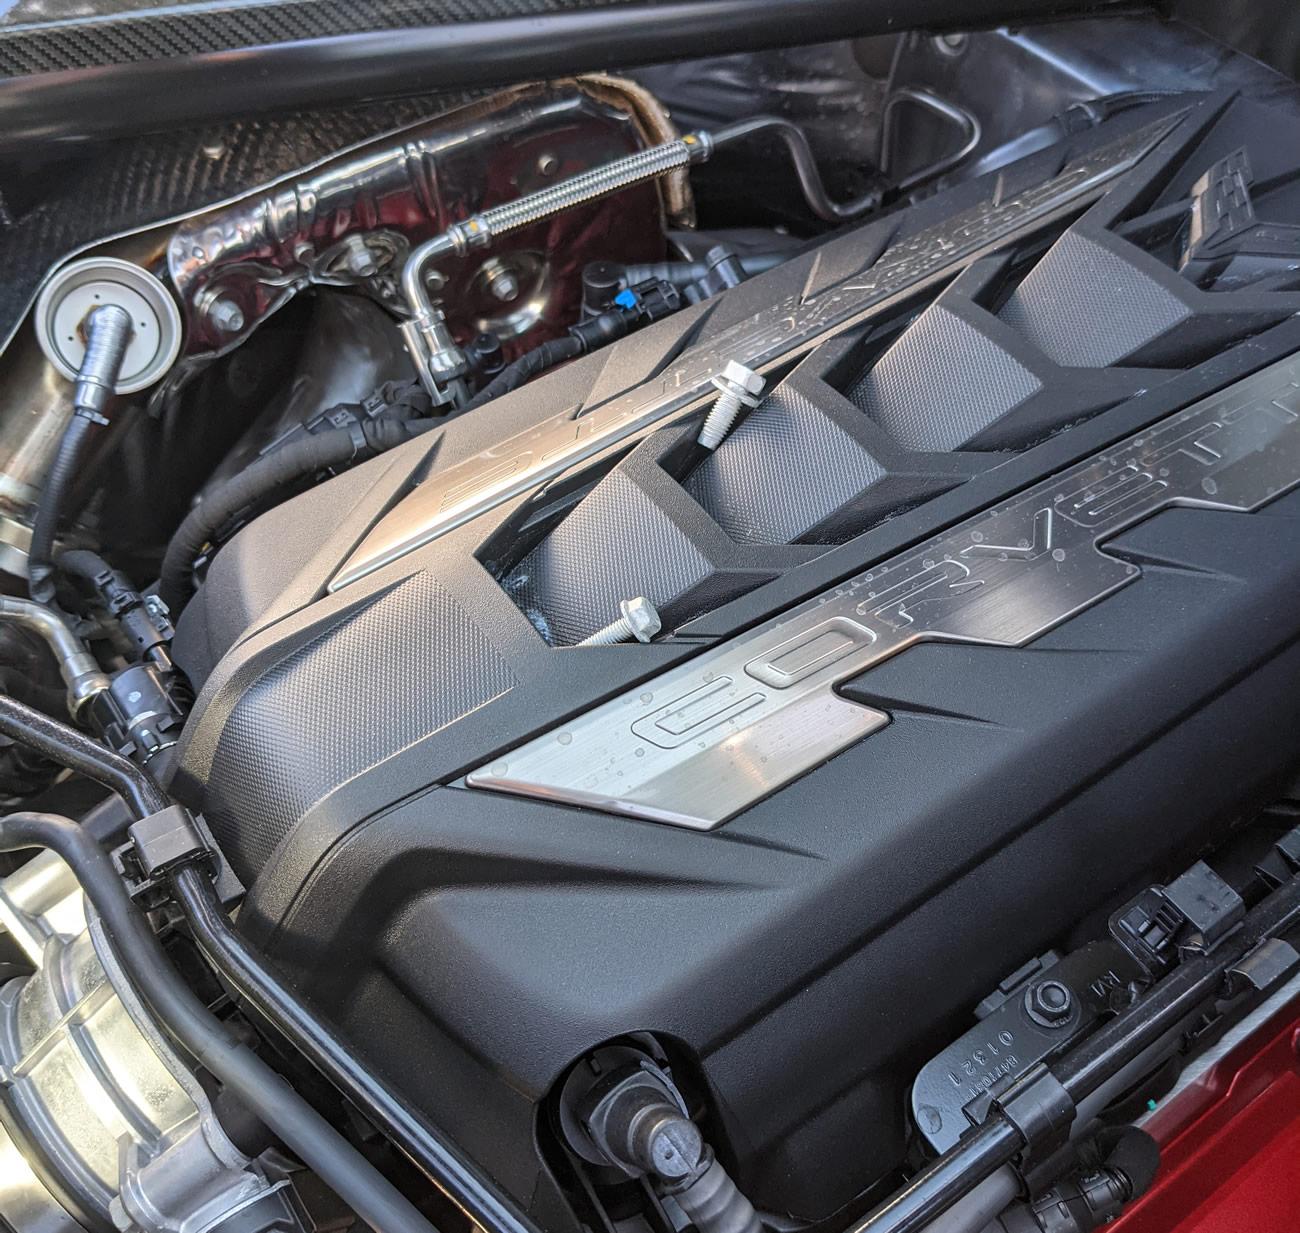 2021-corvette-loose-engine-bolts.jpg